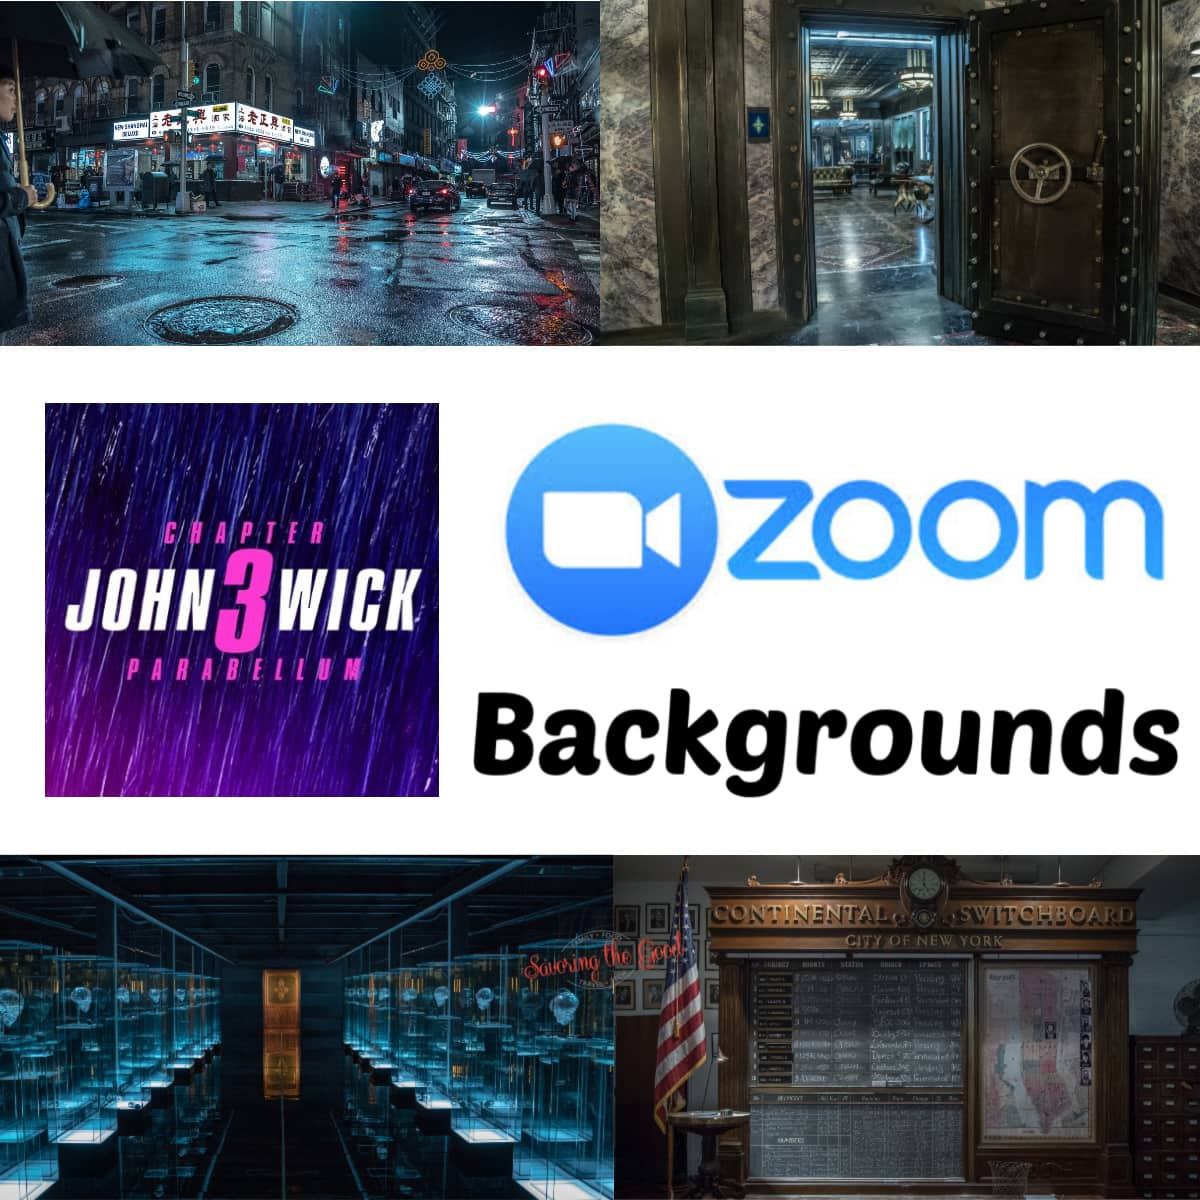 john wick 3 zoom backgrounds